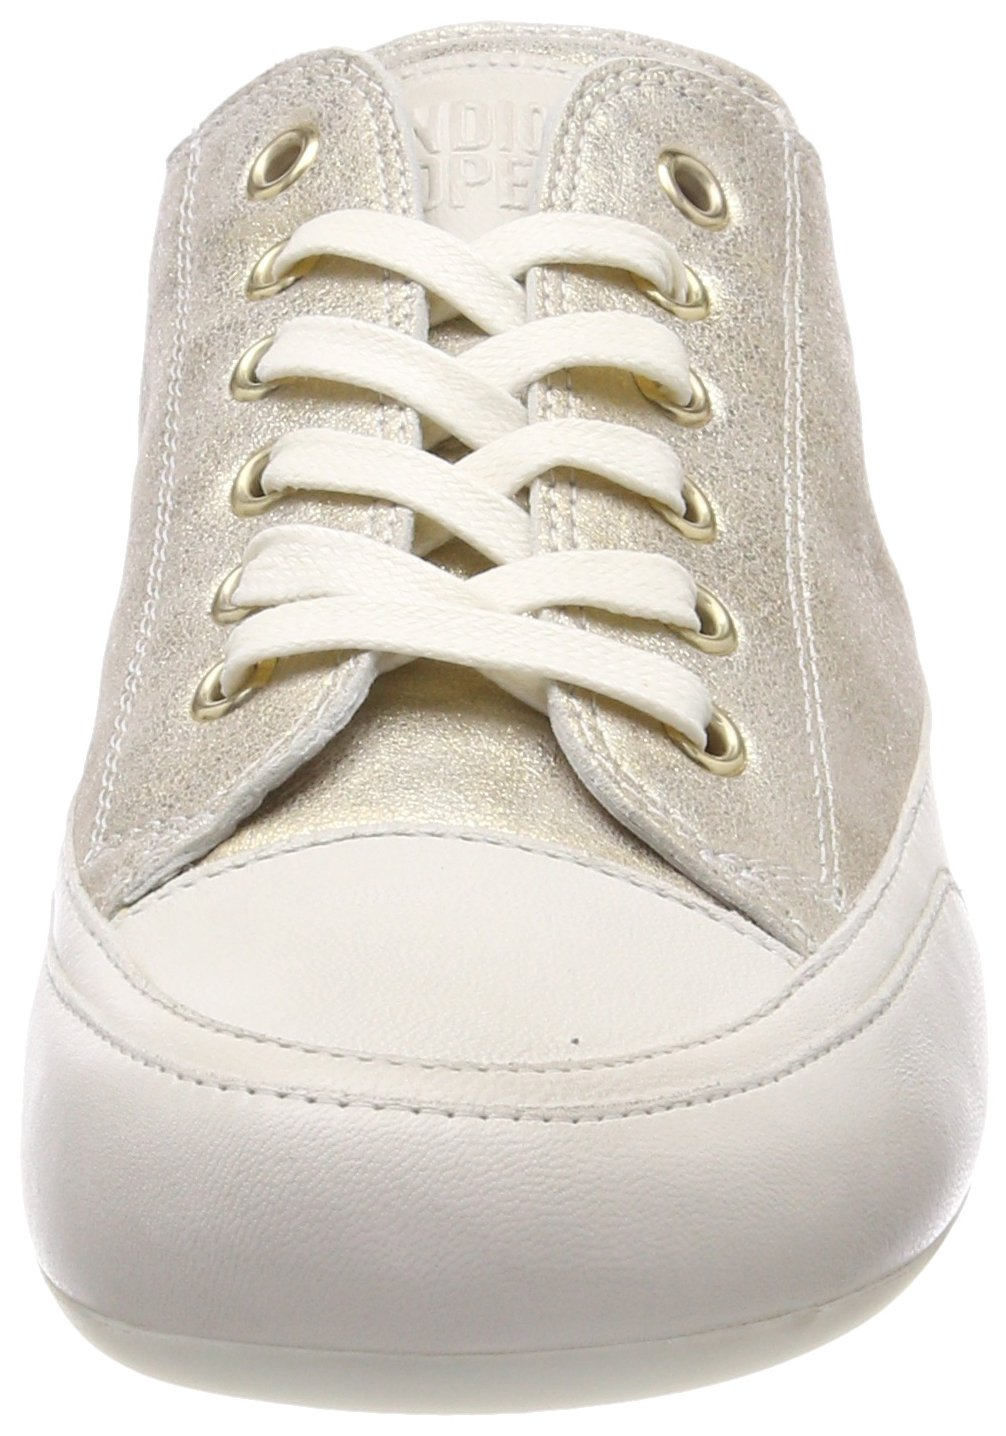 Candice Gold Cooper Damen Passion Sneaker Gold Candice (Platino) 470779